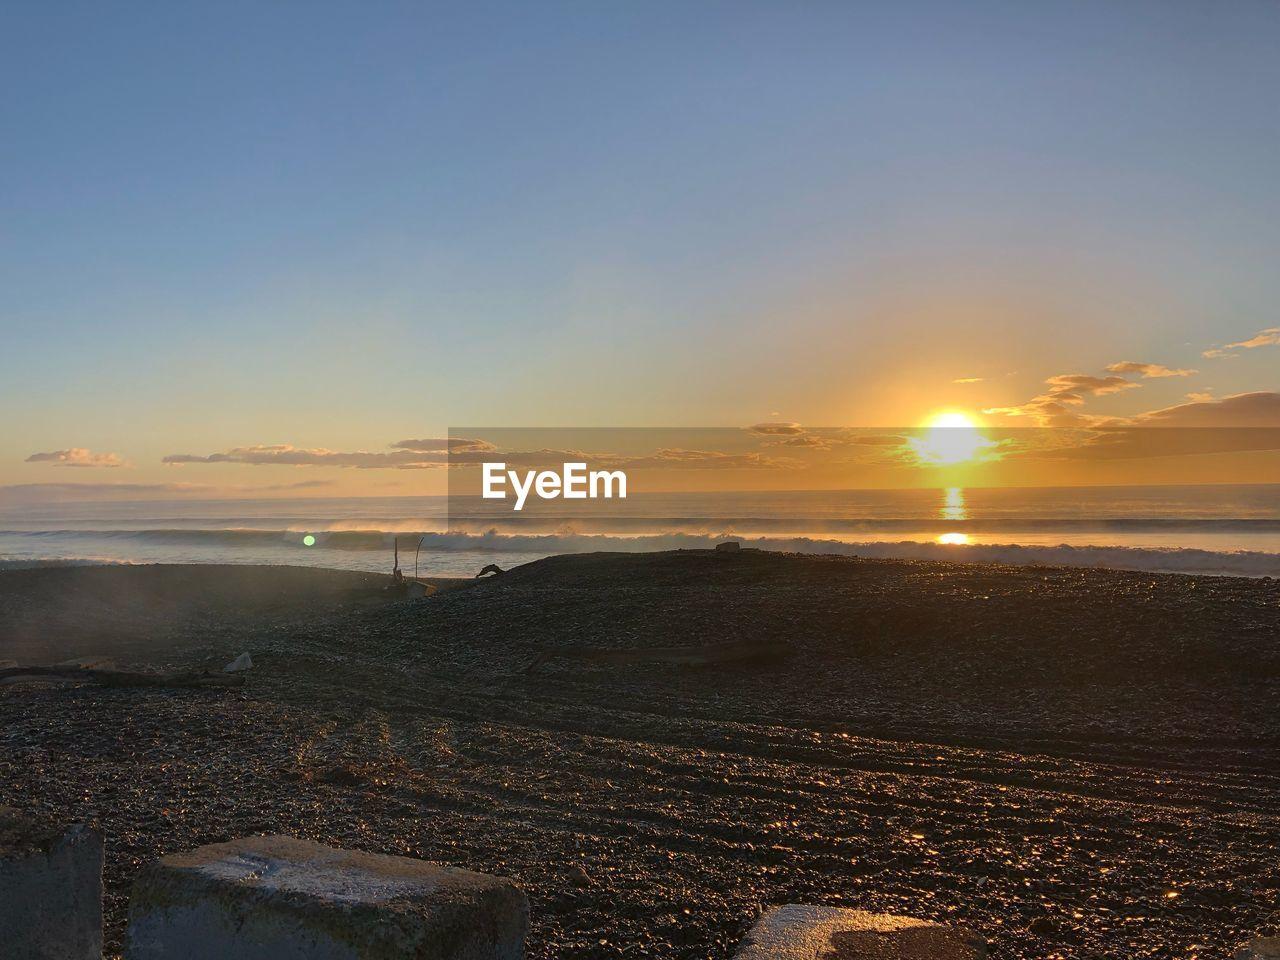 sky, sunset, sea, scenics - nature, water, beauty in nature, beach, land, nature, tranquility, tranquil scene, sun, sunlight, idyllic, horizon, horizon over water, cloud - sky, non-urban scene, orange color, no people, outdoors